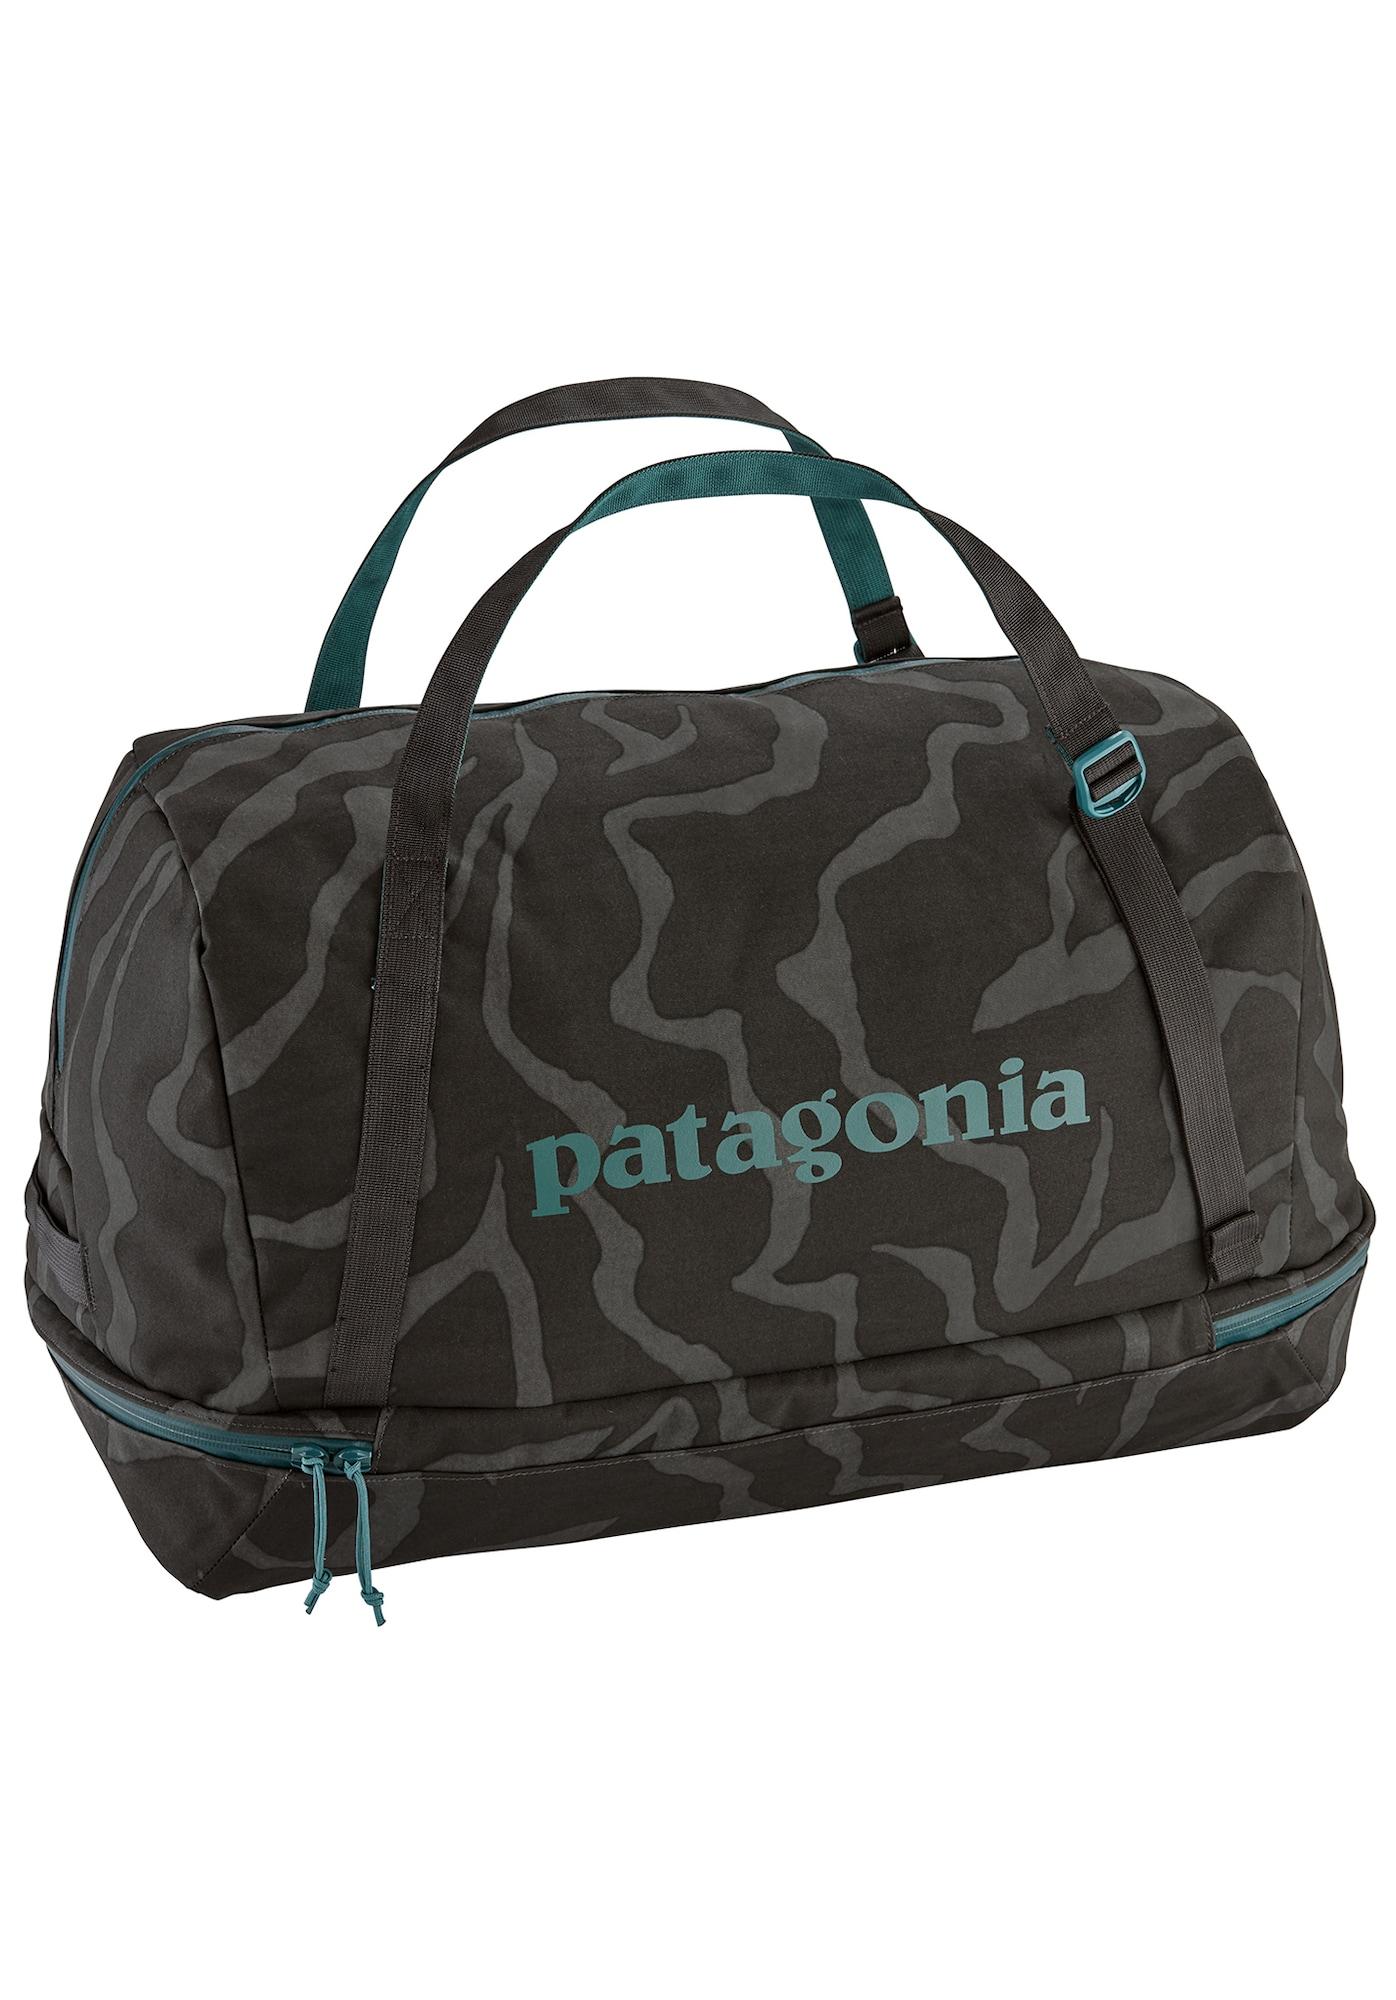 PATAGONIA, Herren Sporttas Planing Duffel, pastelblauw / basaltgrijs / zwart